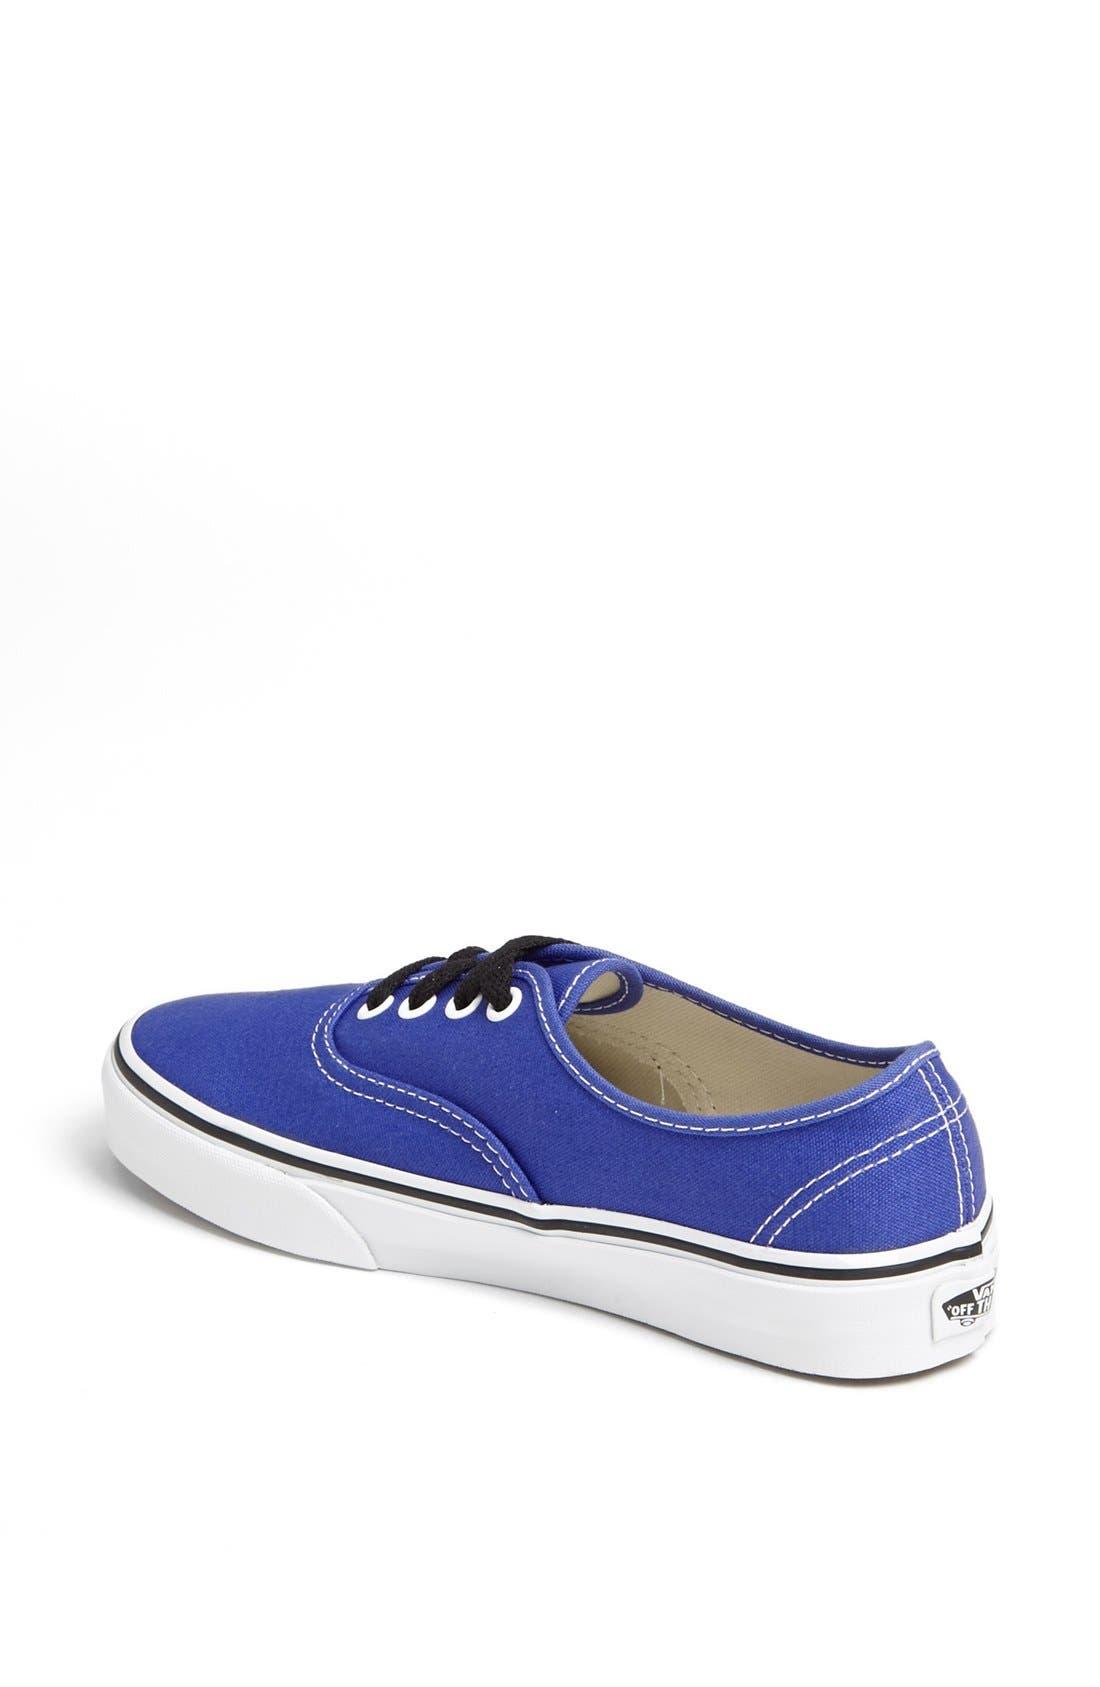 Alternate Image 2  - Vans 'Authentic' Sneaker (Women)